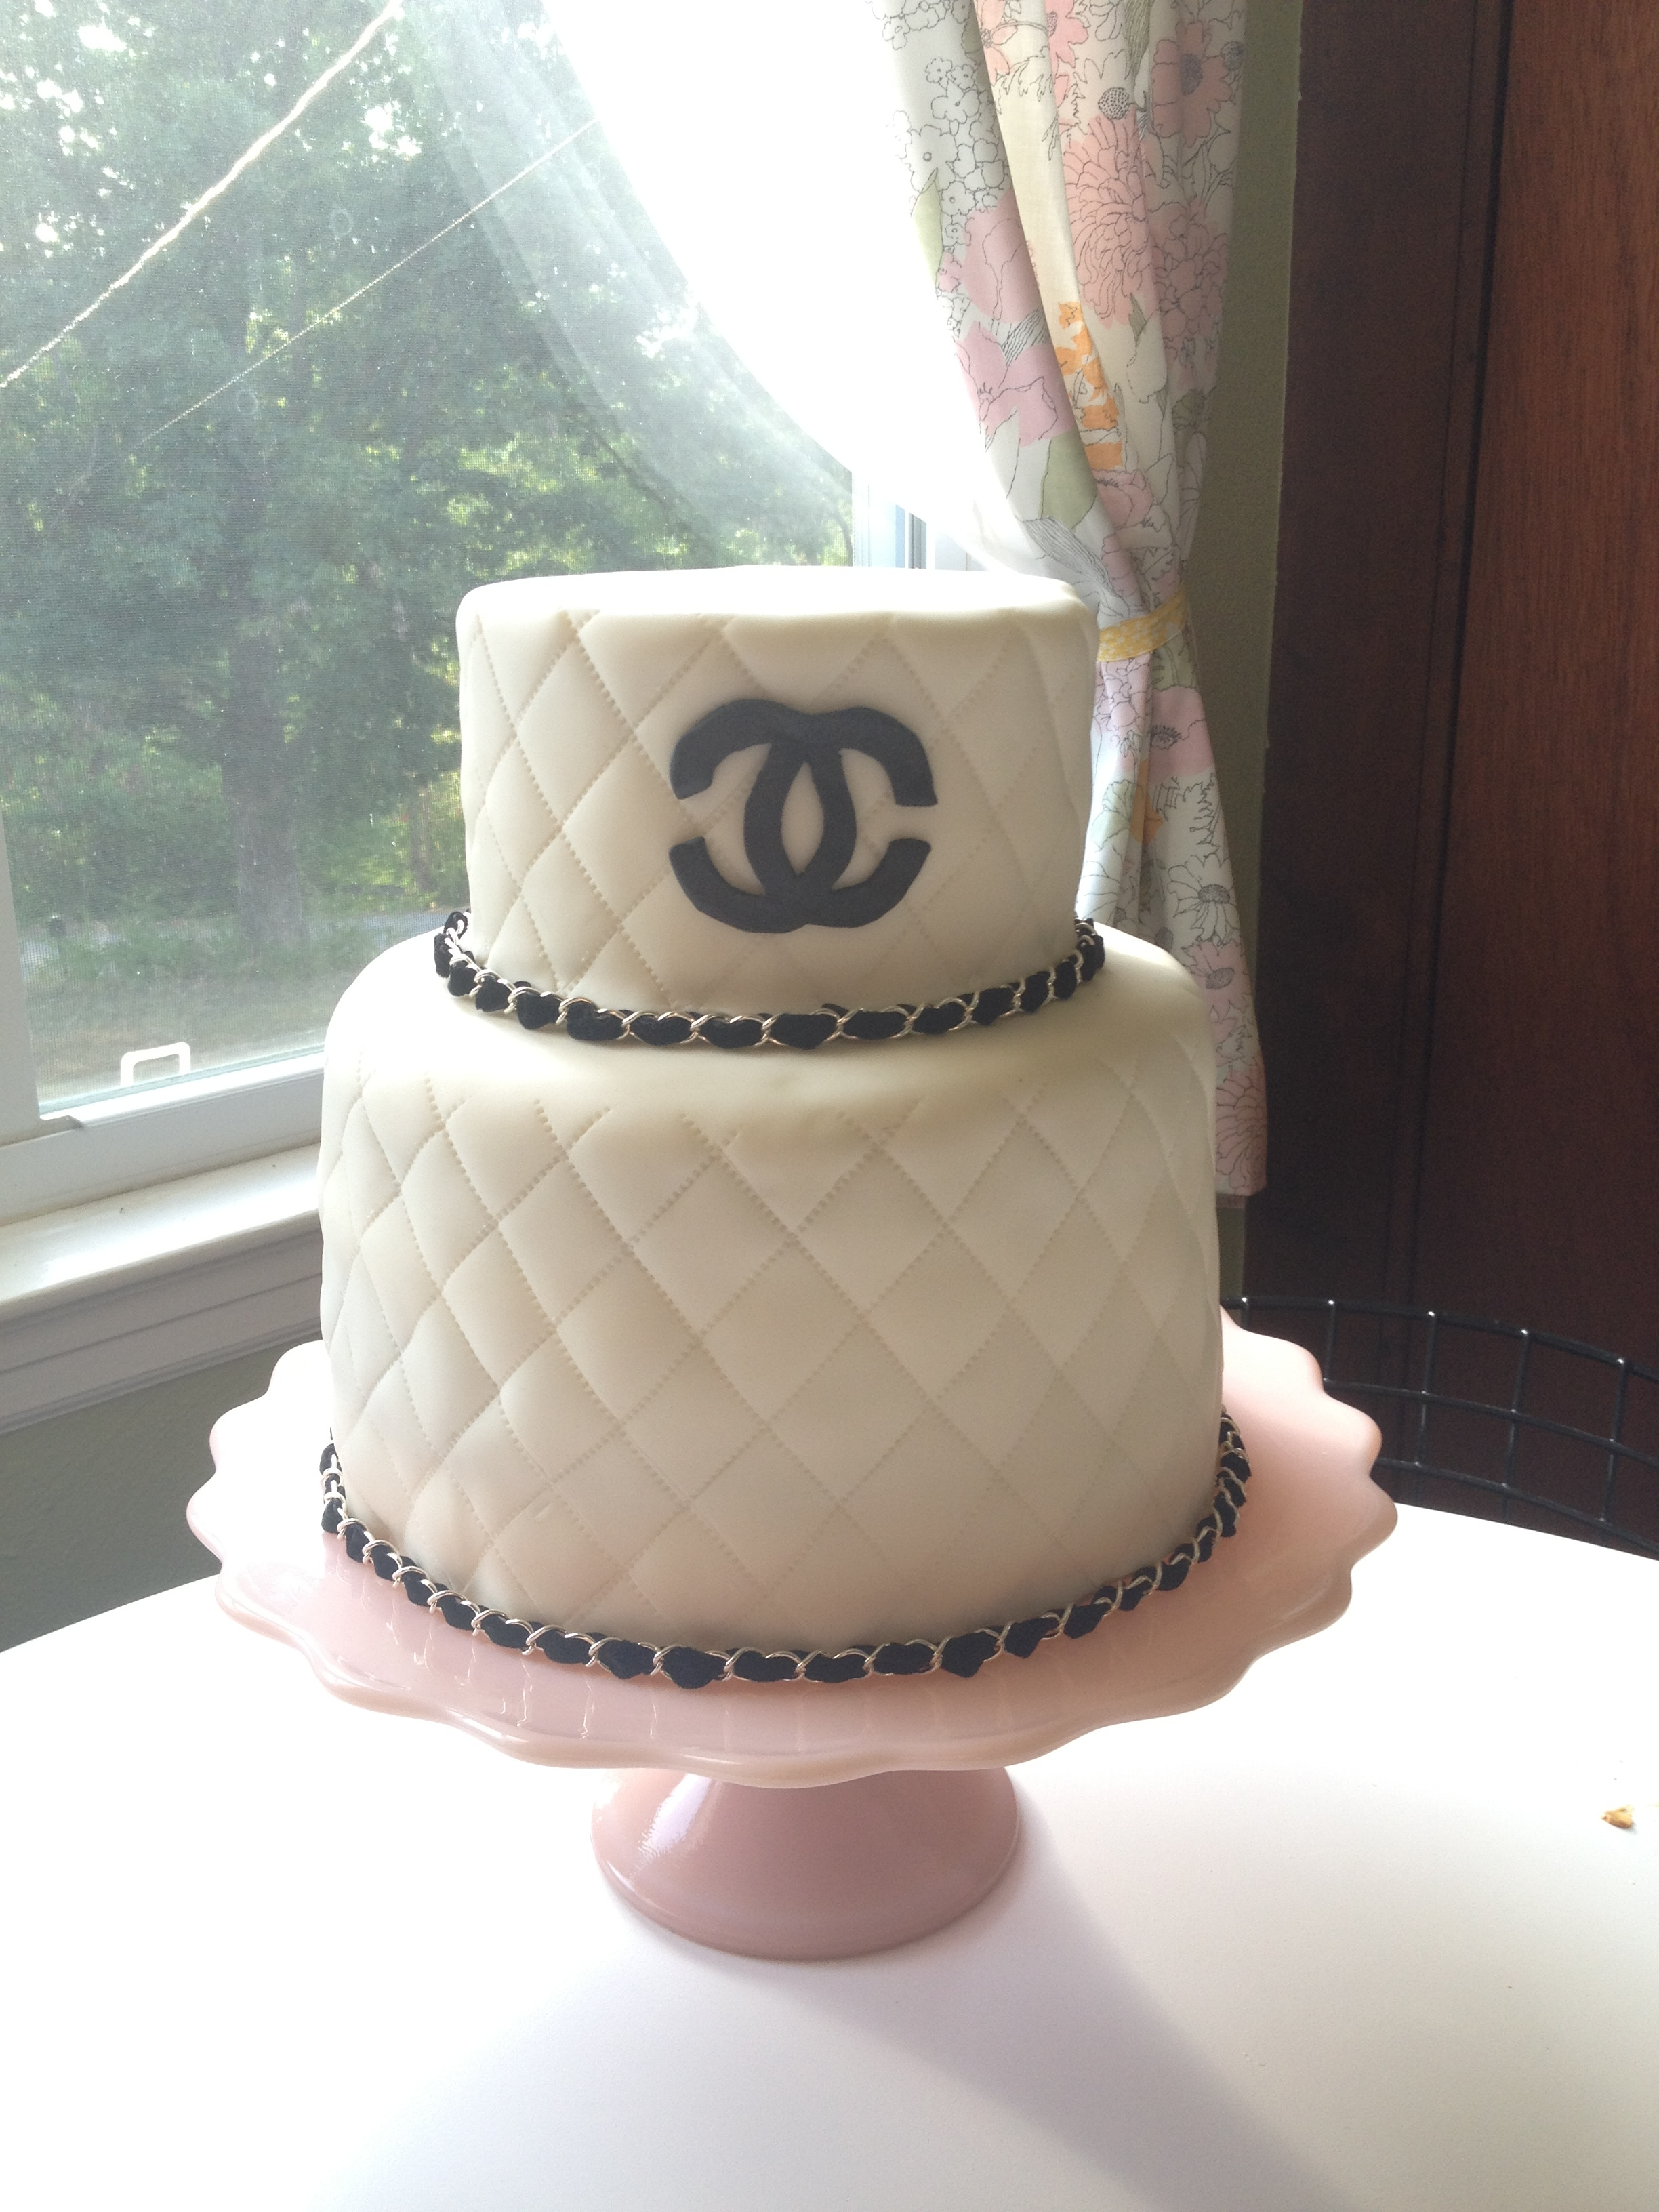 chanel-cake_7601524478_o.jpg